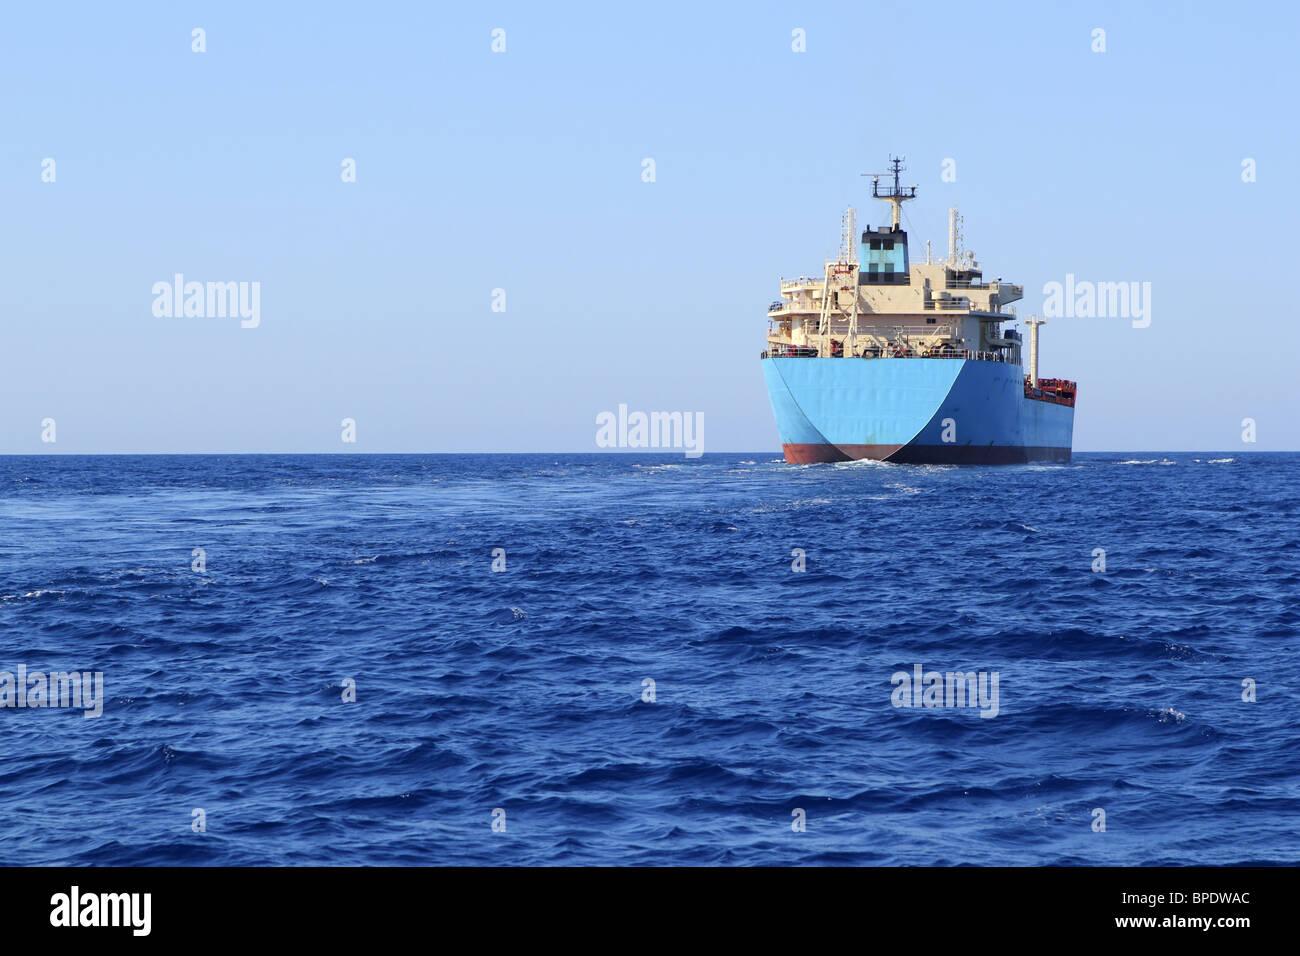 chemical transport boat offshore sailing tanker cargo blue ocean sea - Stock Image